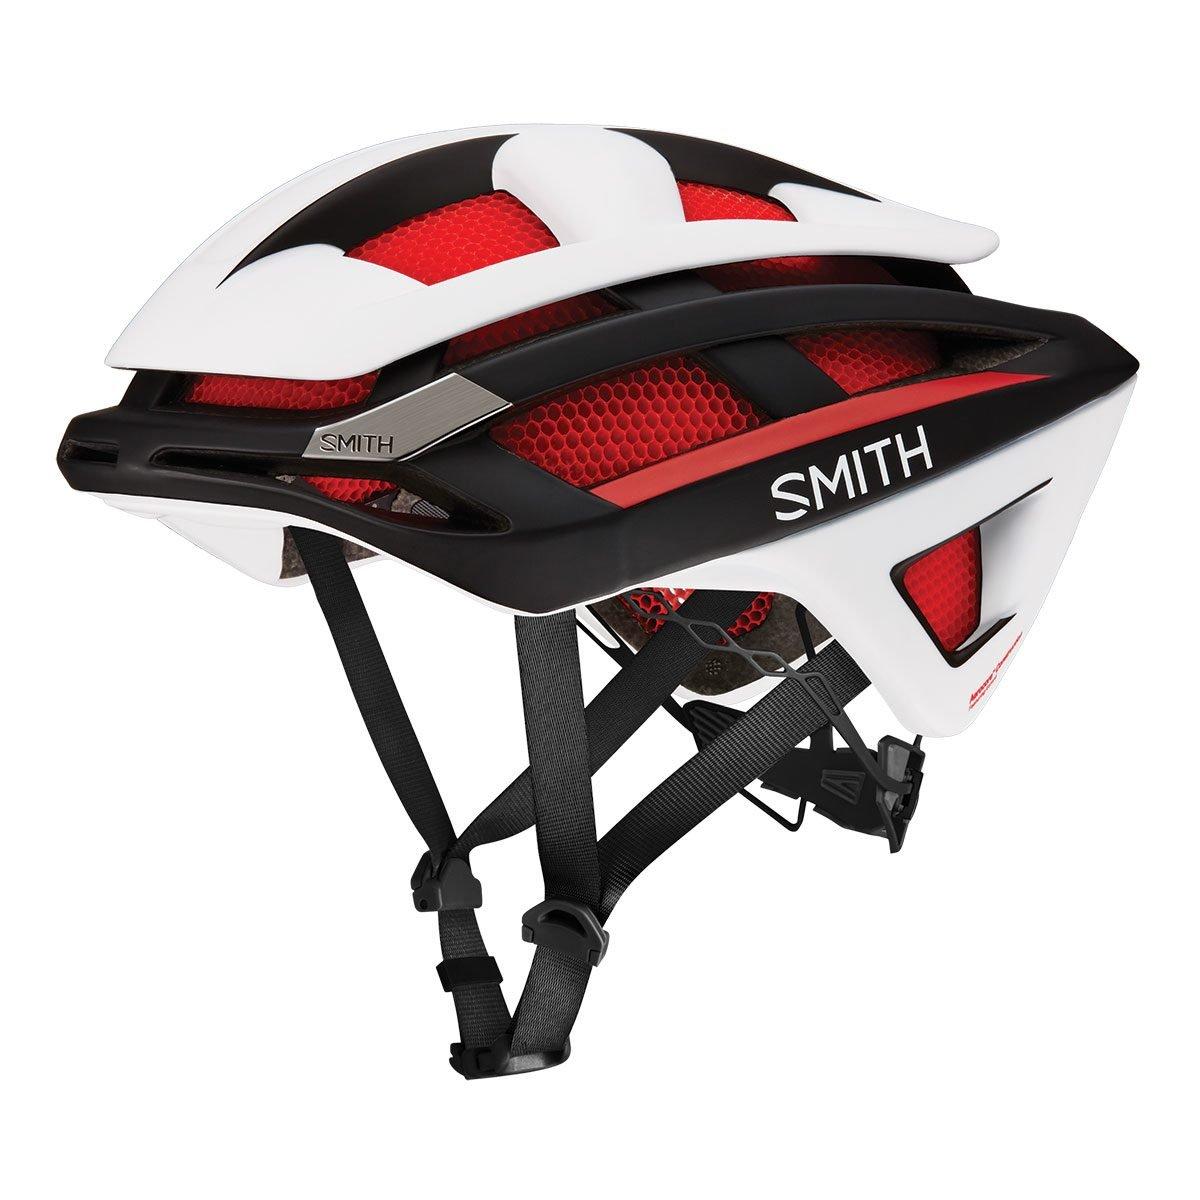 Smith Optics Overtake Helmet Medium Matte Red/White/Black